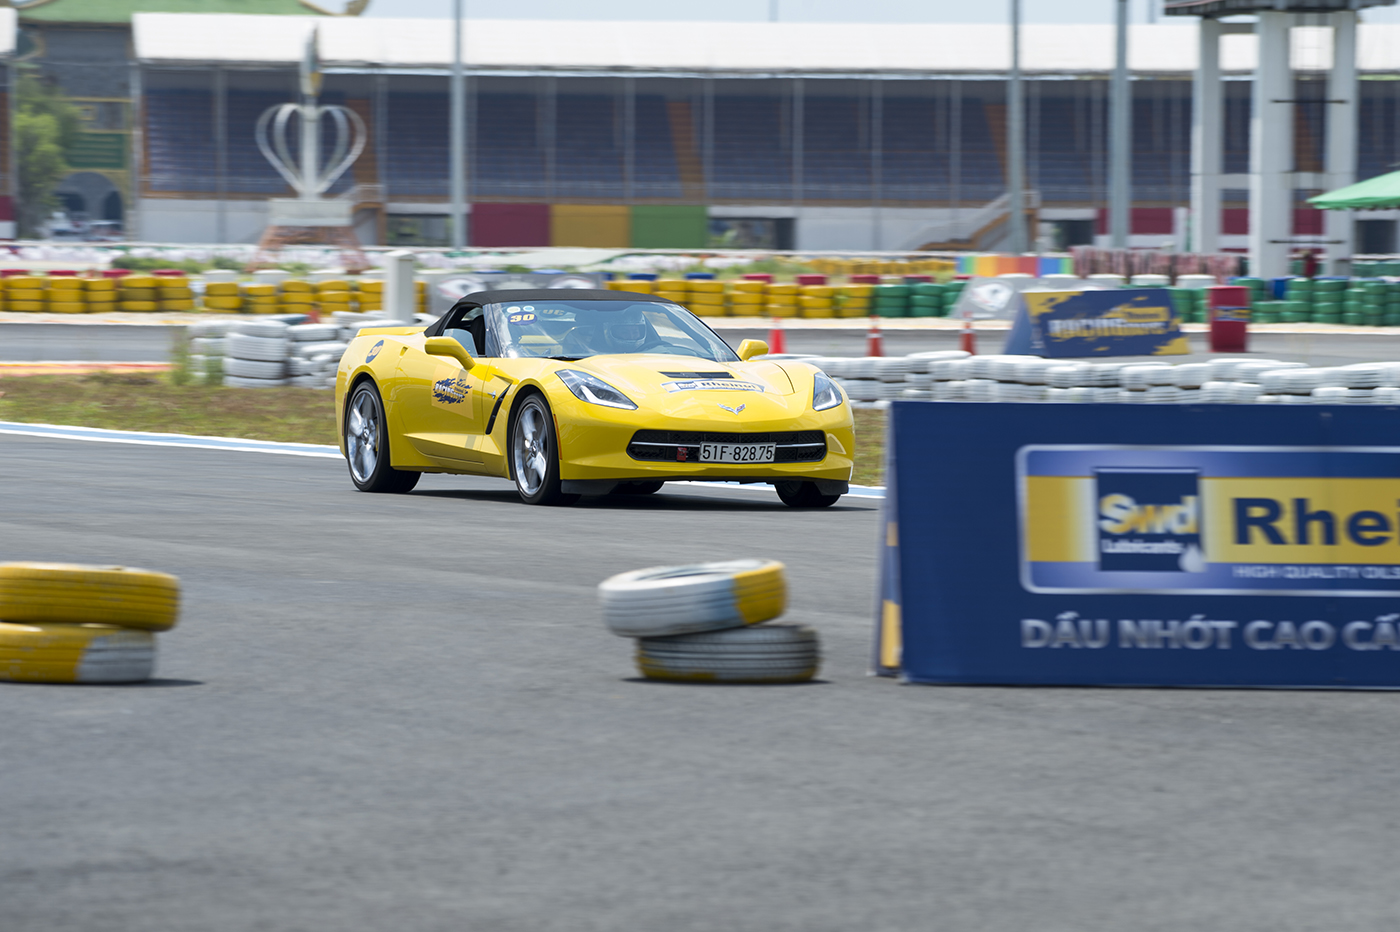 rheinol-racing-days-autodaily-0-40.jpg